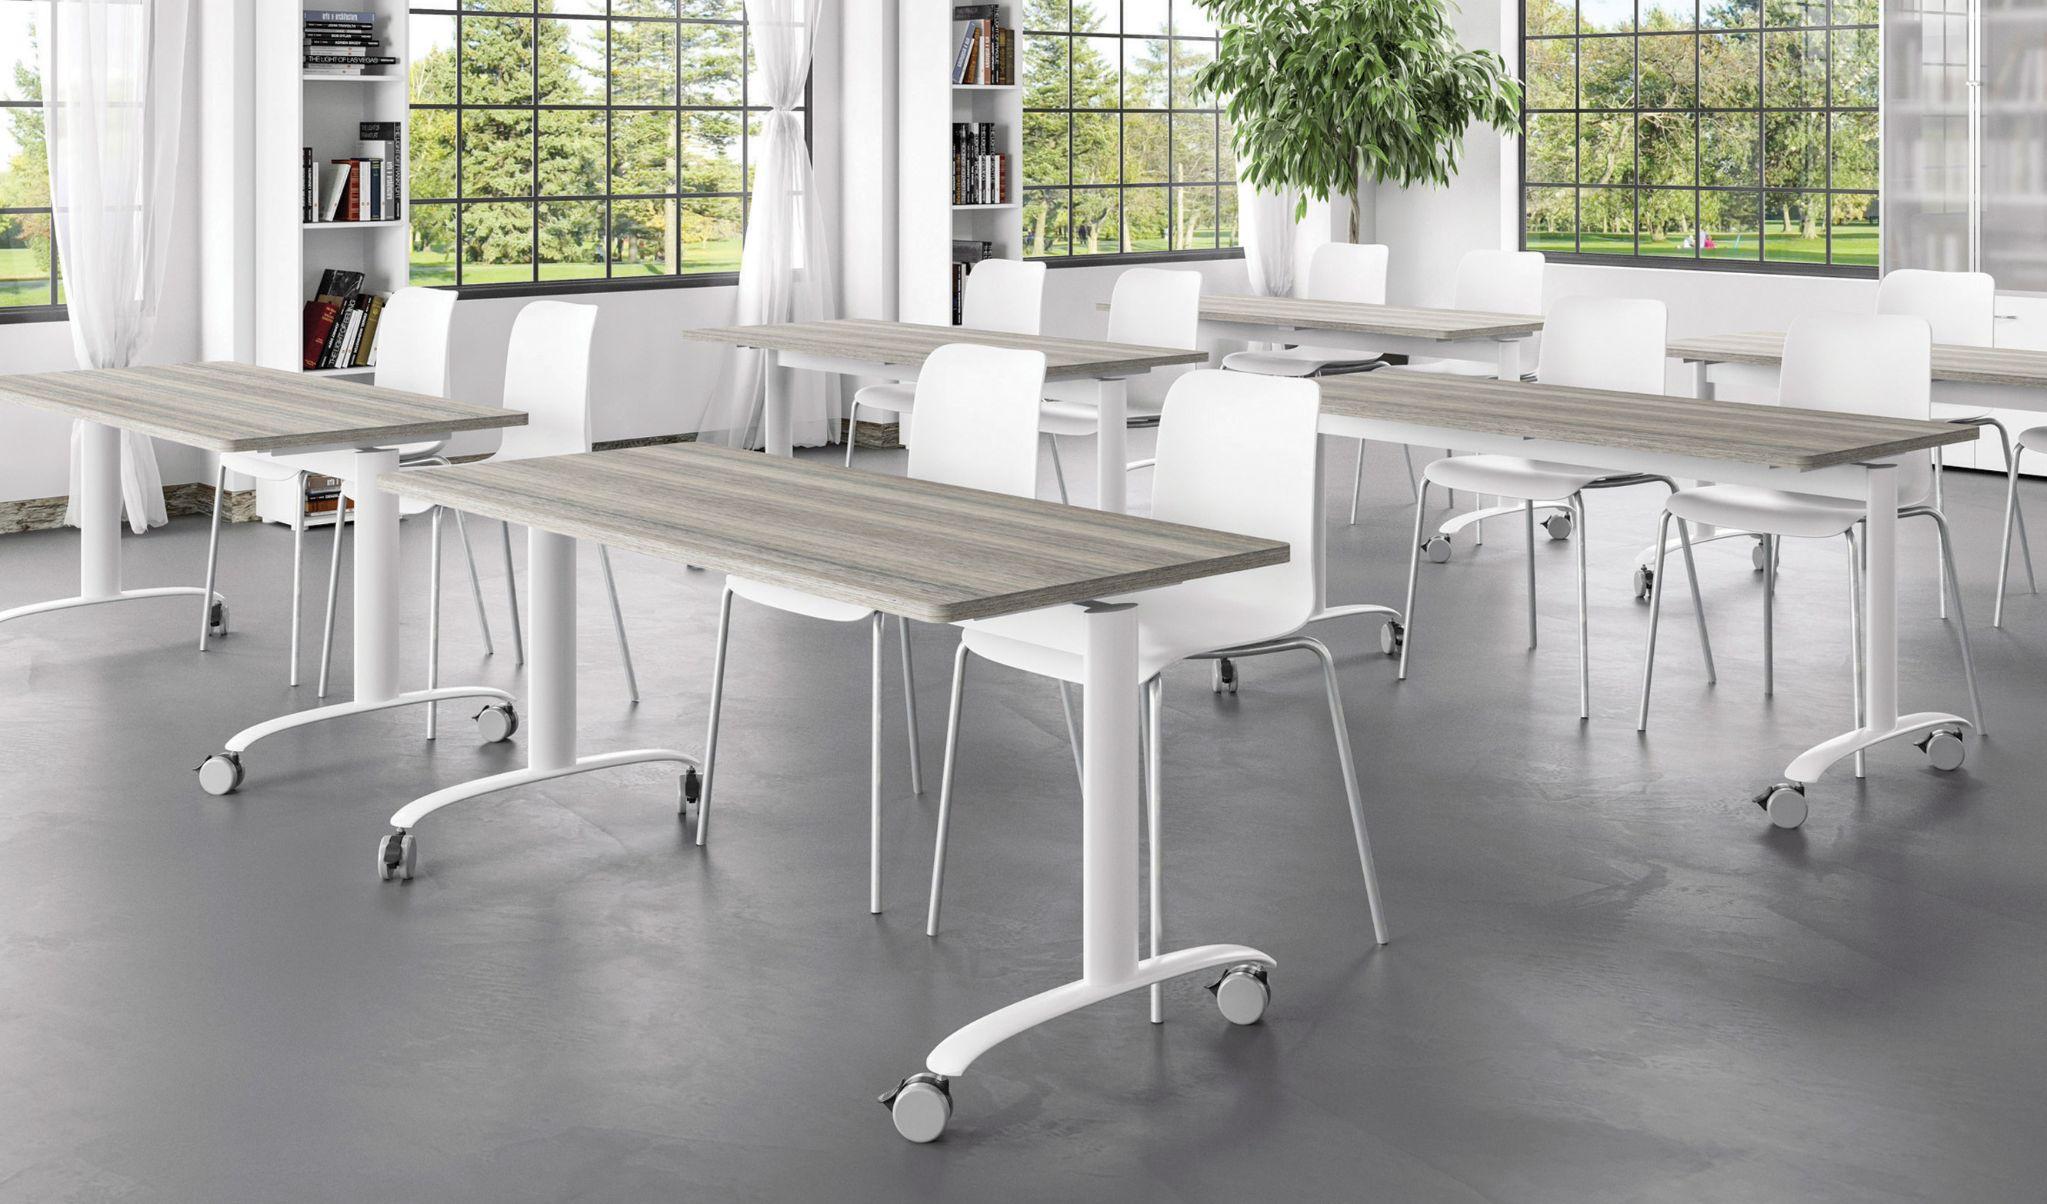 Buronomic mobilier bureau modele Eureka table